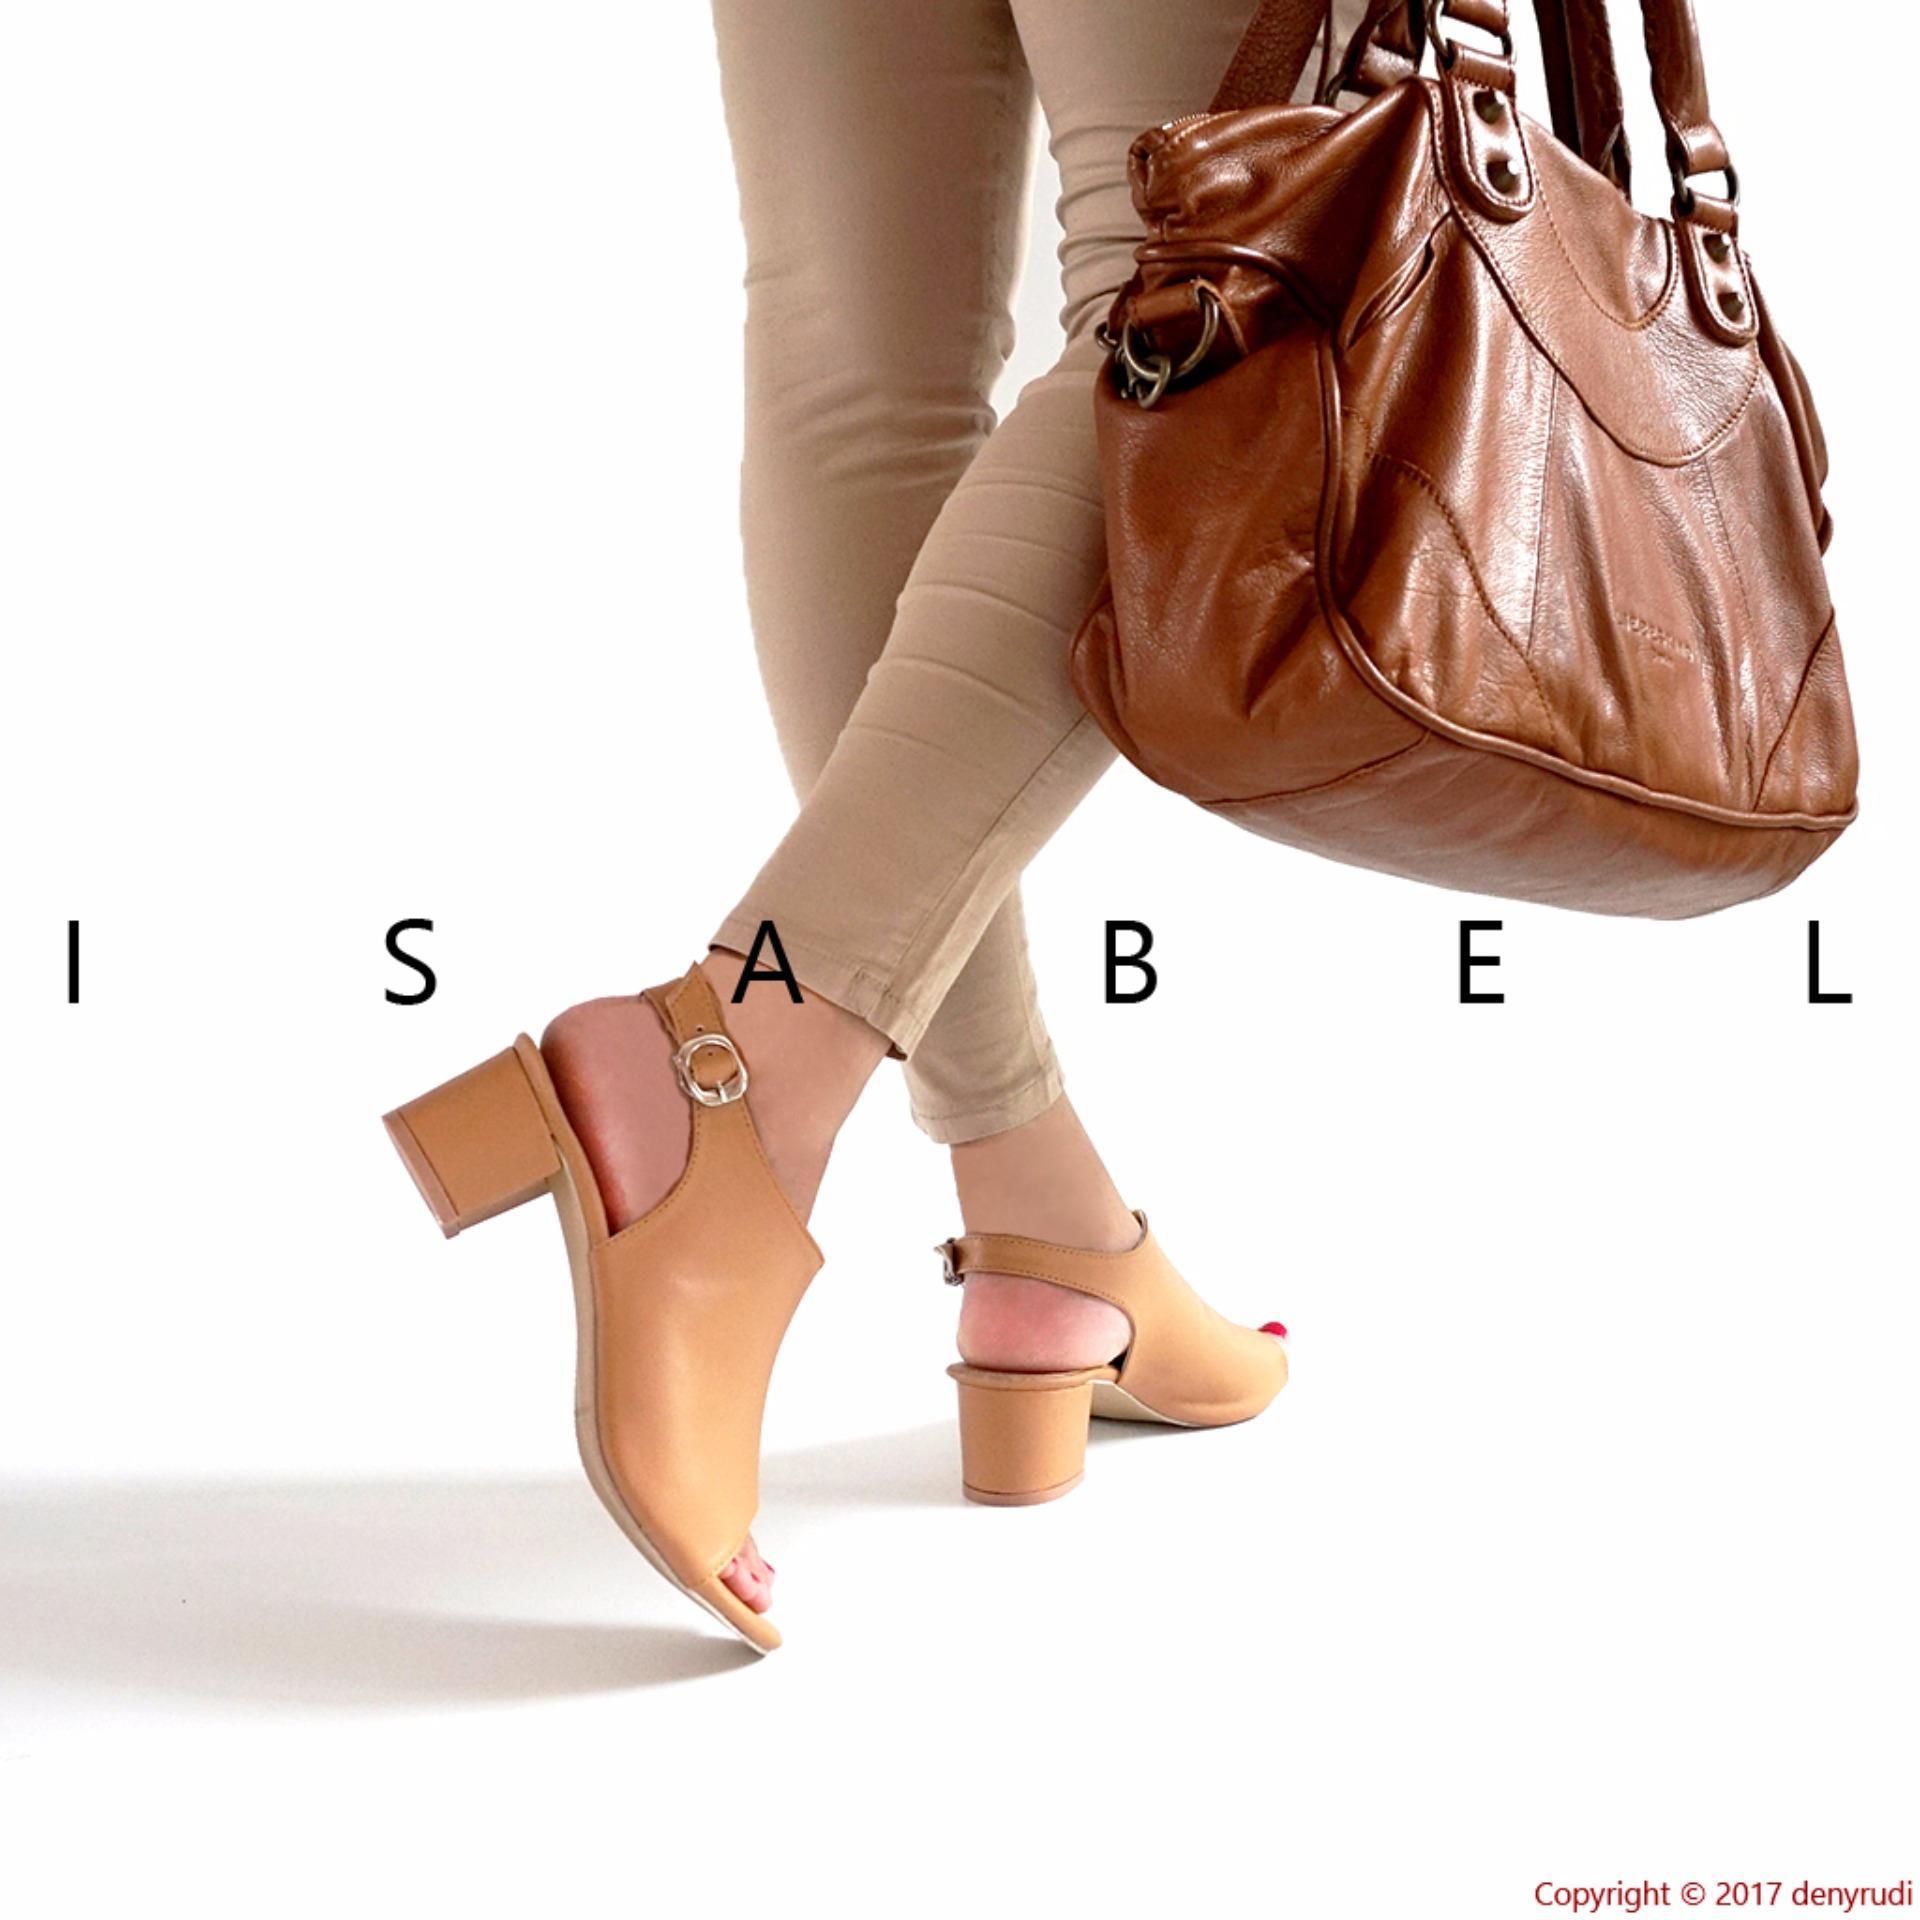 Isabel - Sepatu Wanita Hak Tahu SELENA Heels - Coklat